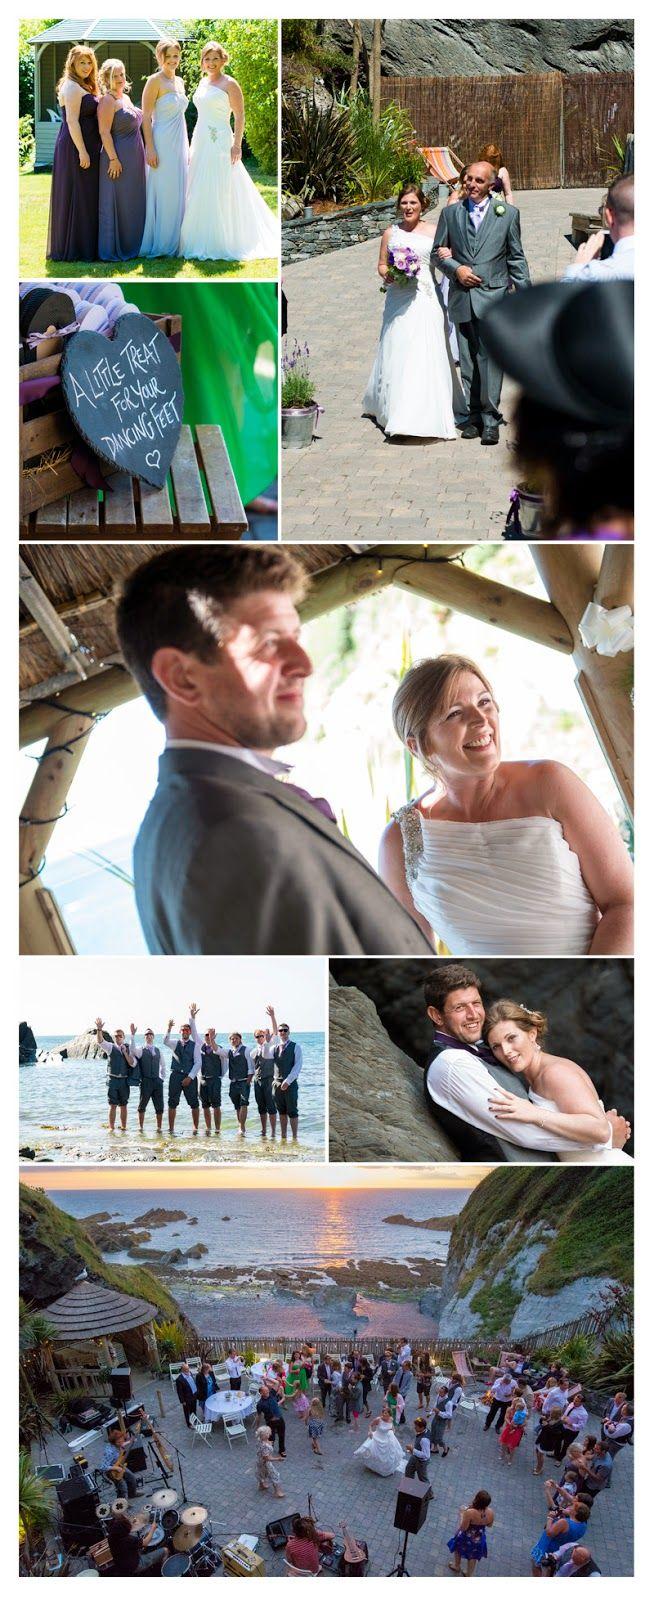 Michael Wells Photography: Kim & Mark's Tunnels Beaches Wedding